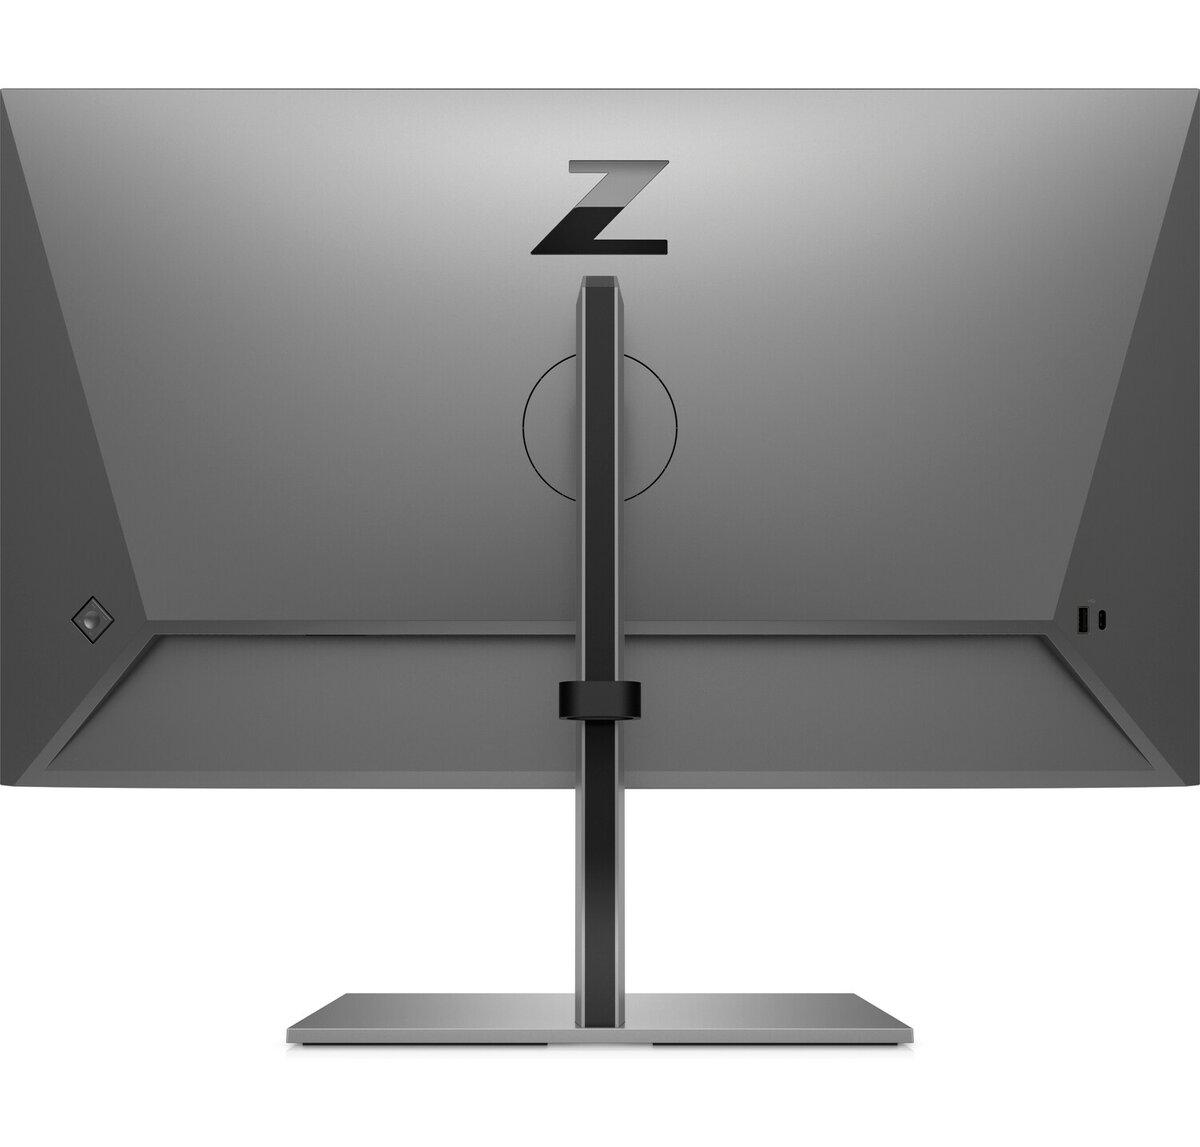 Màn hình HP Z27xs G3 4K USB-C DreamColor (1A9M8AA)